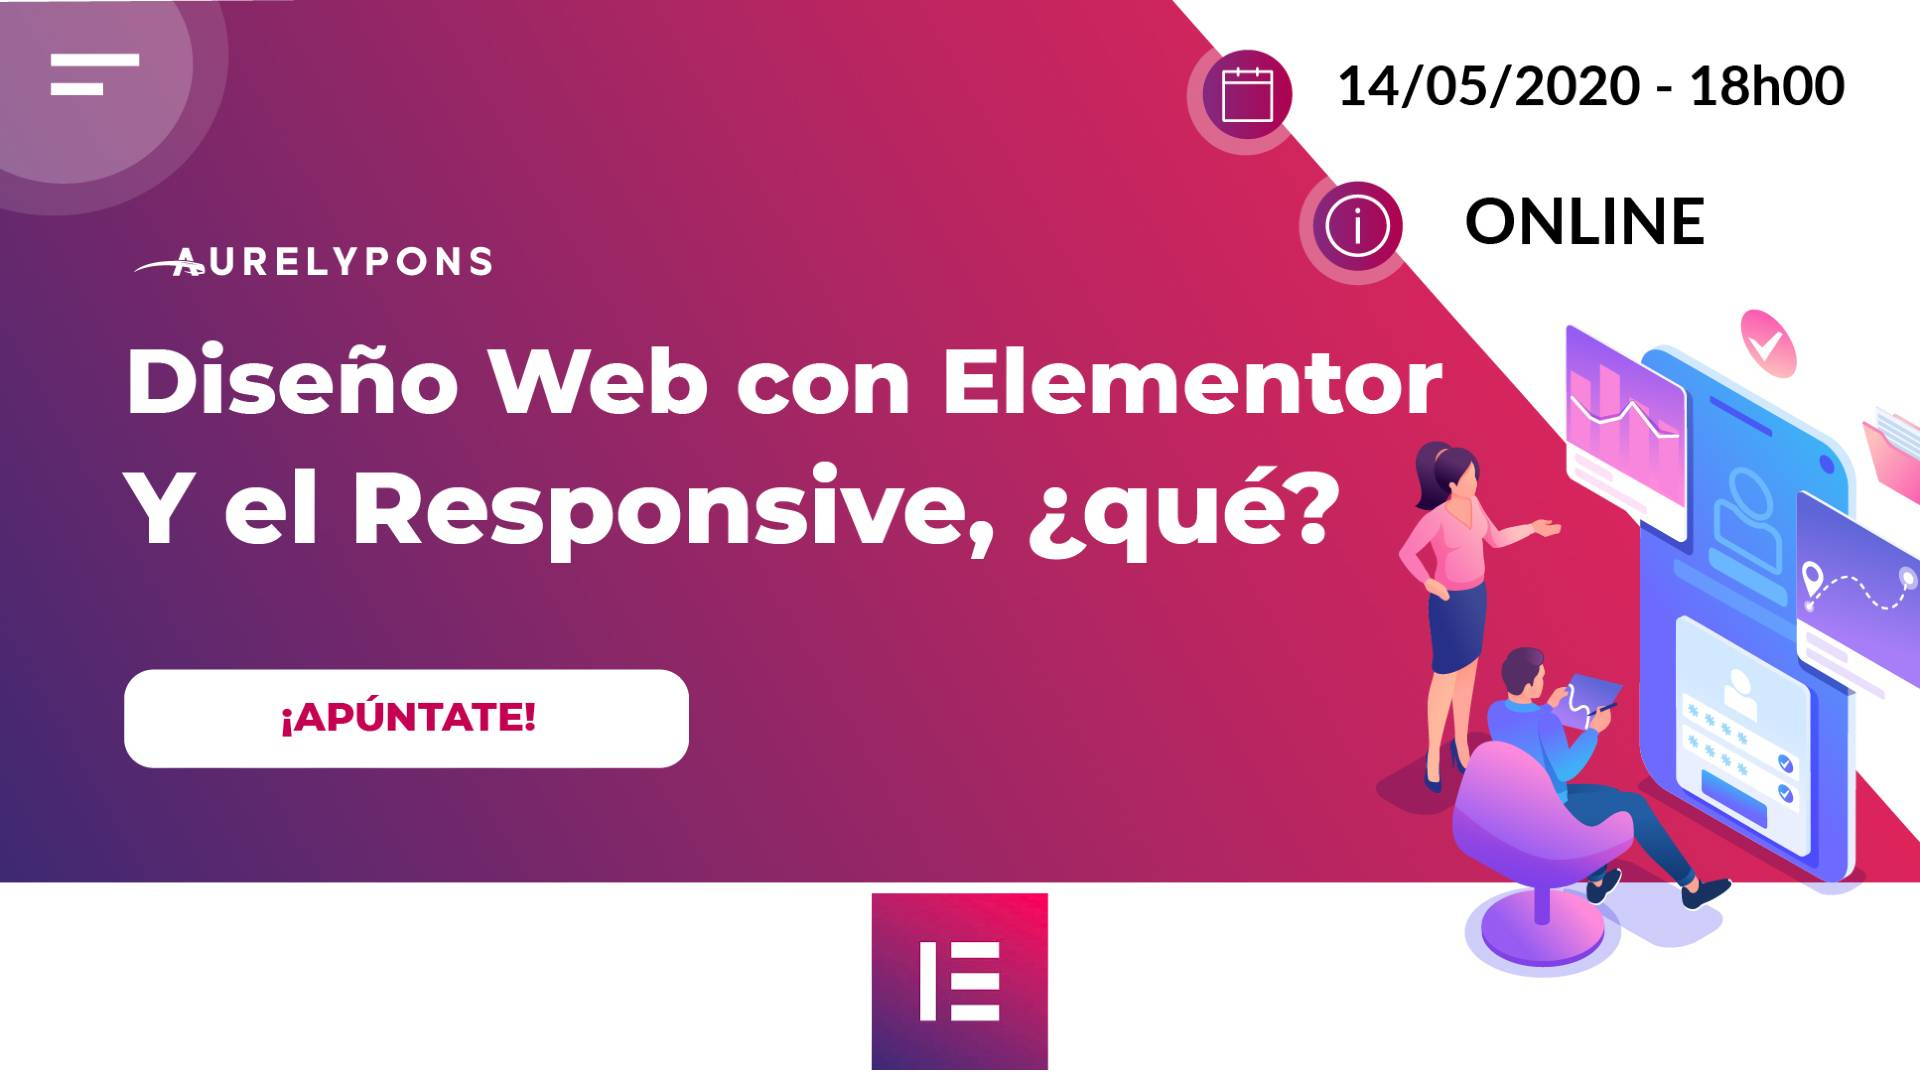 Meetup online Elementor Responsive Aure